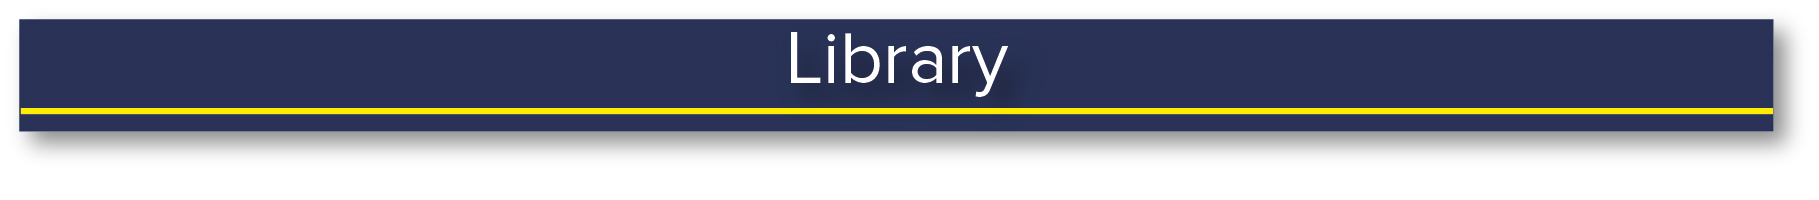 Library heading.jpg